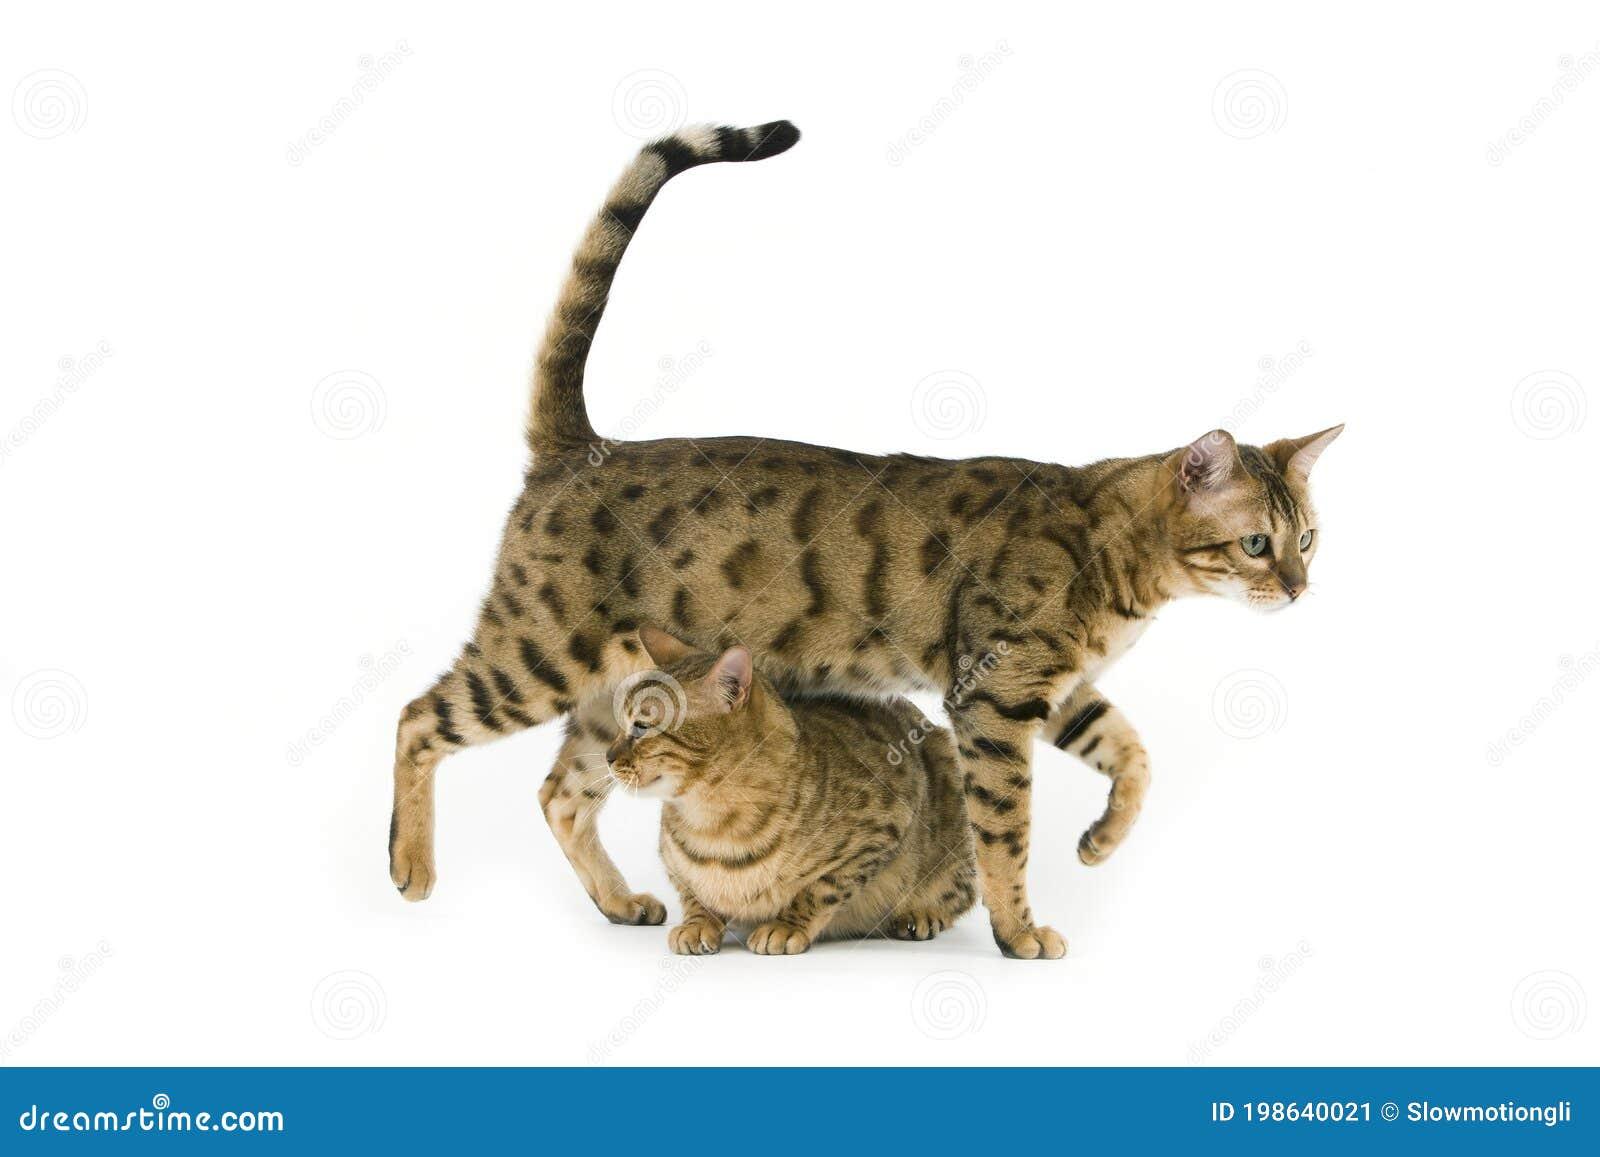 Stellung cat